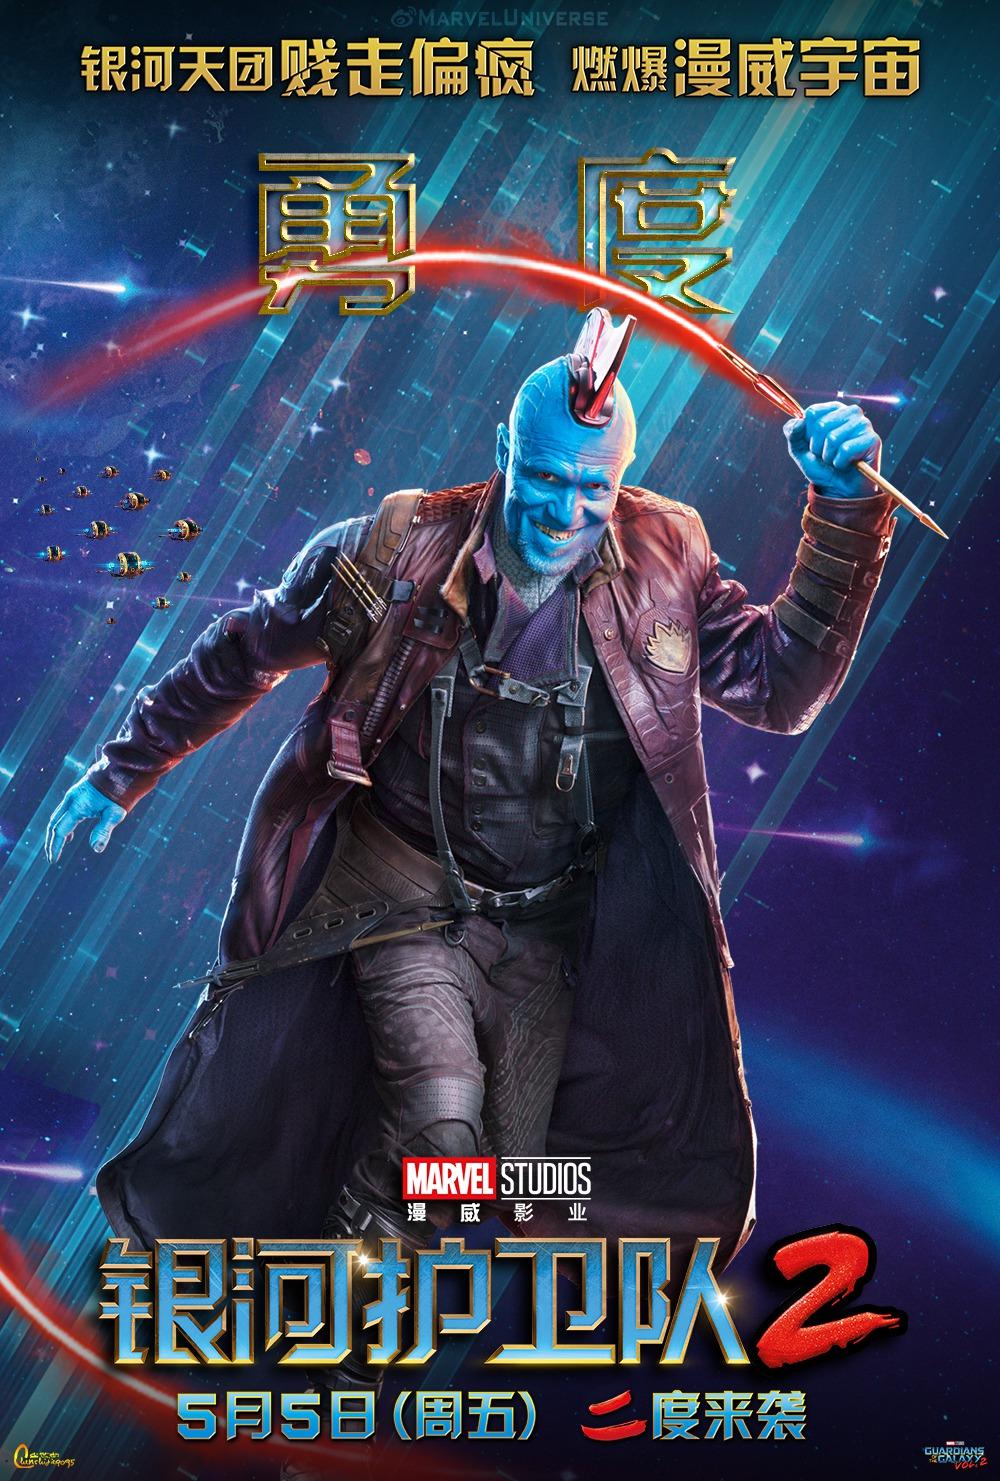 Guardians Of The Galaxy Vol.2 Stream